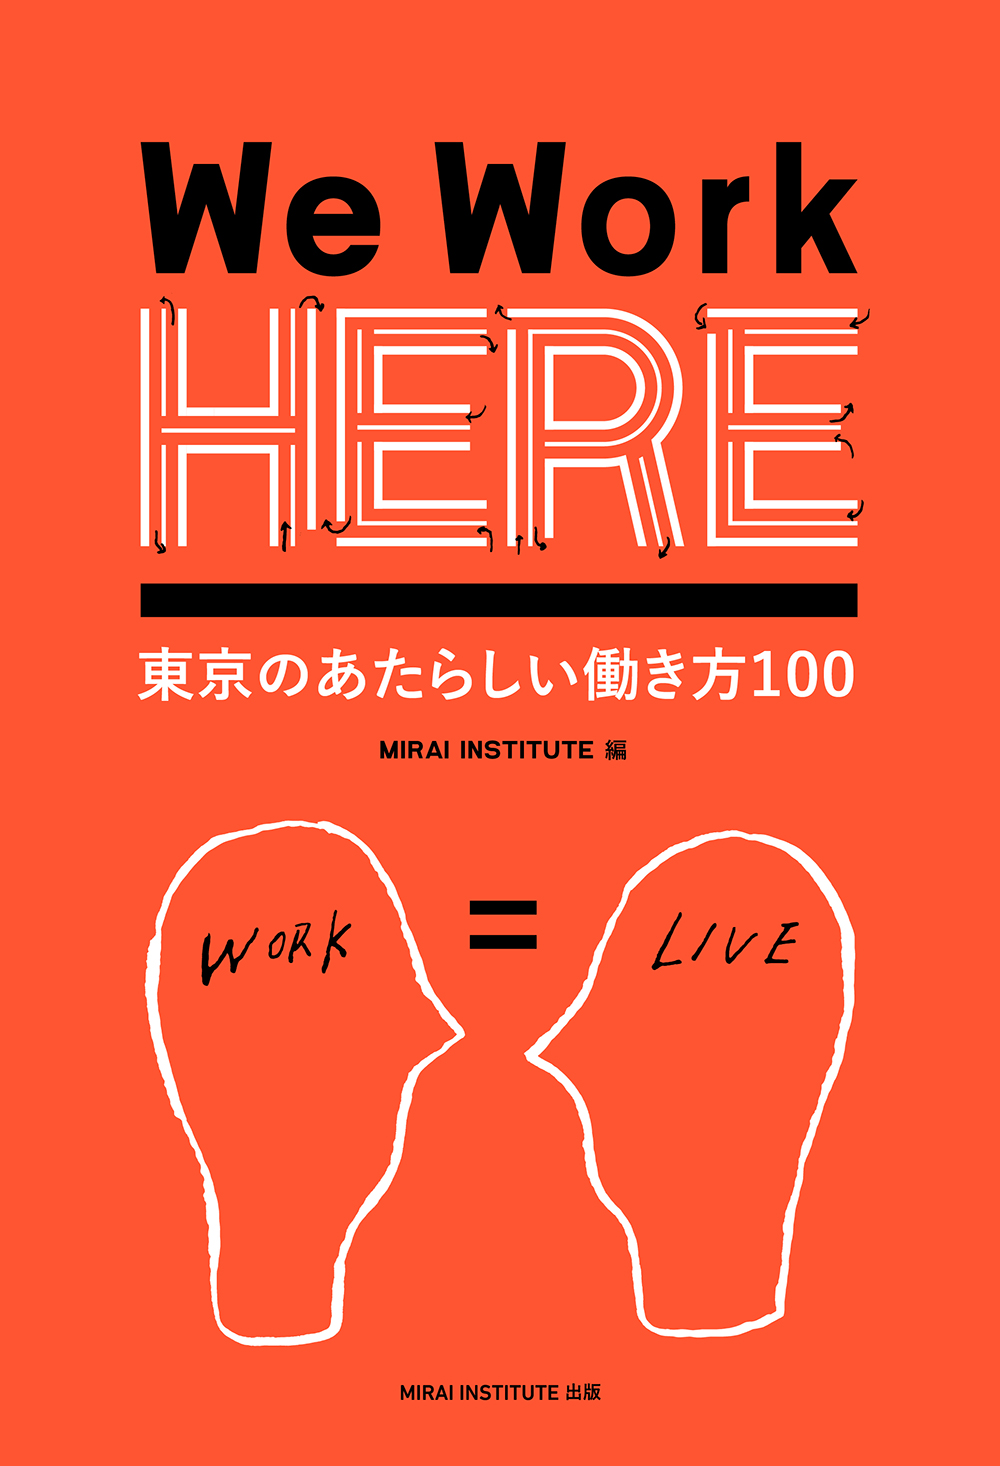 we work here 東京のあたらしい働き方100 2016年8月8日 発売